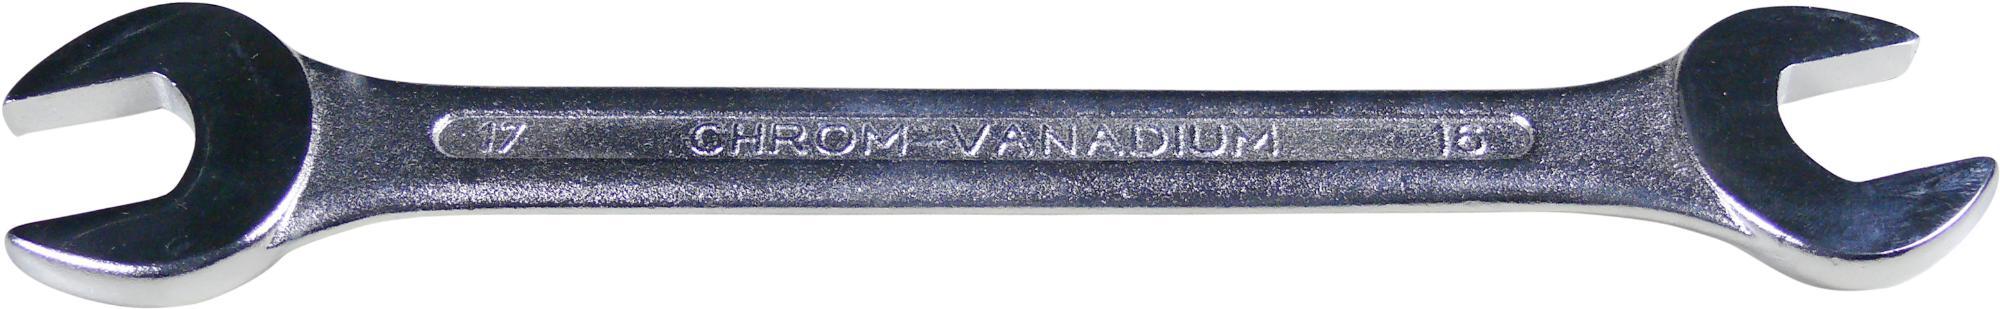 Kľúč vidlica-vidlica, 8x9 mm